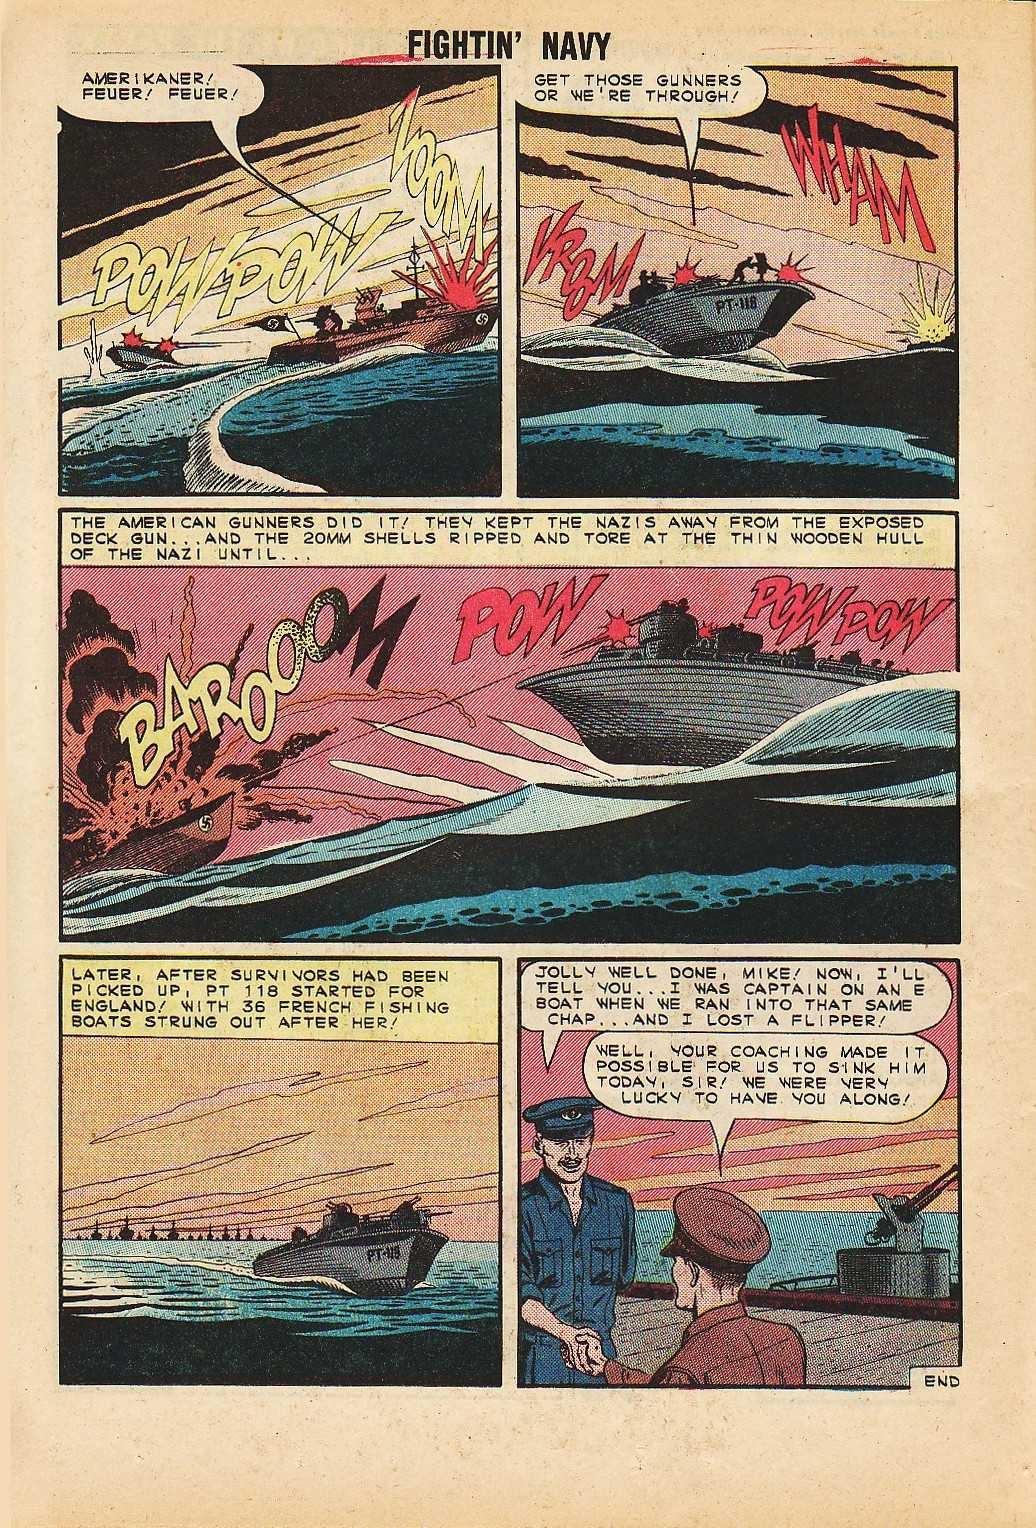 Read online Fightin' Navy comic -  Issue #116 - 16